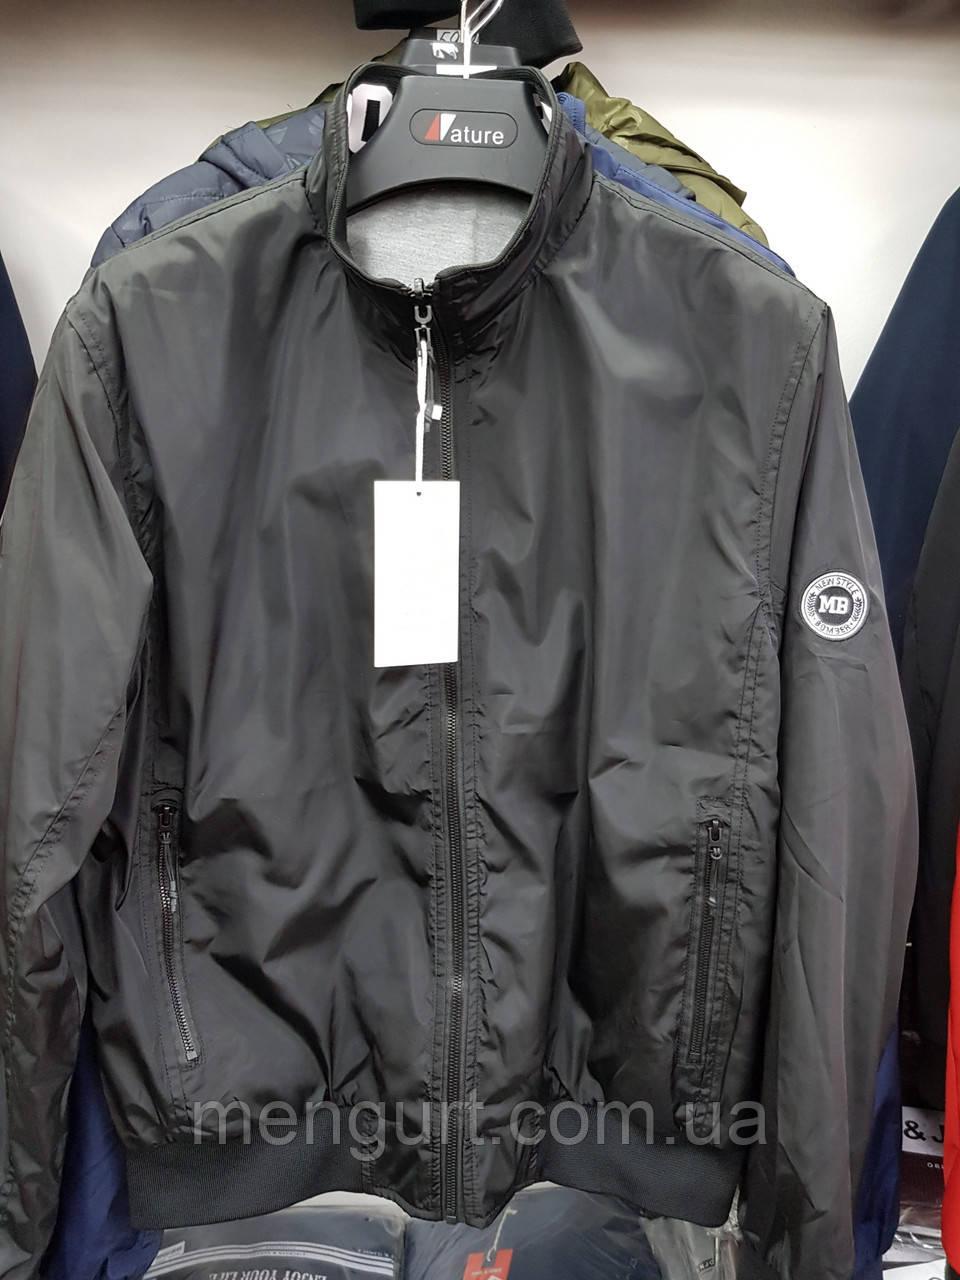 Спортивная куртка мужская без капюшона БАТАЛ